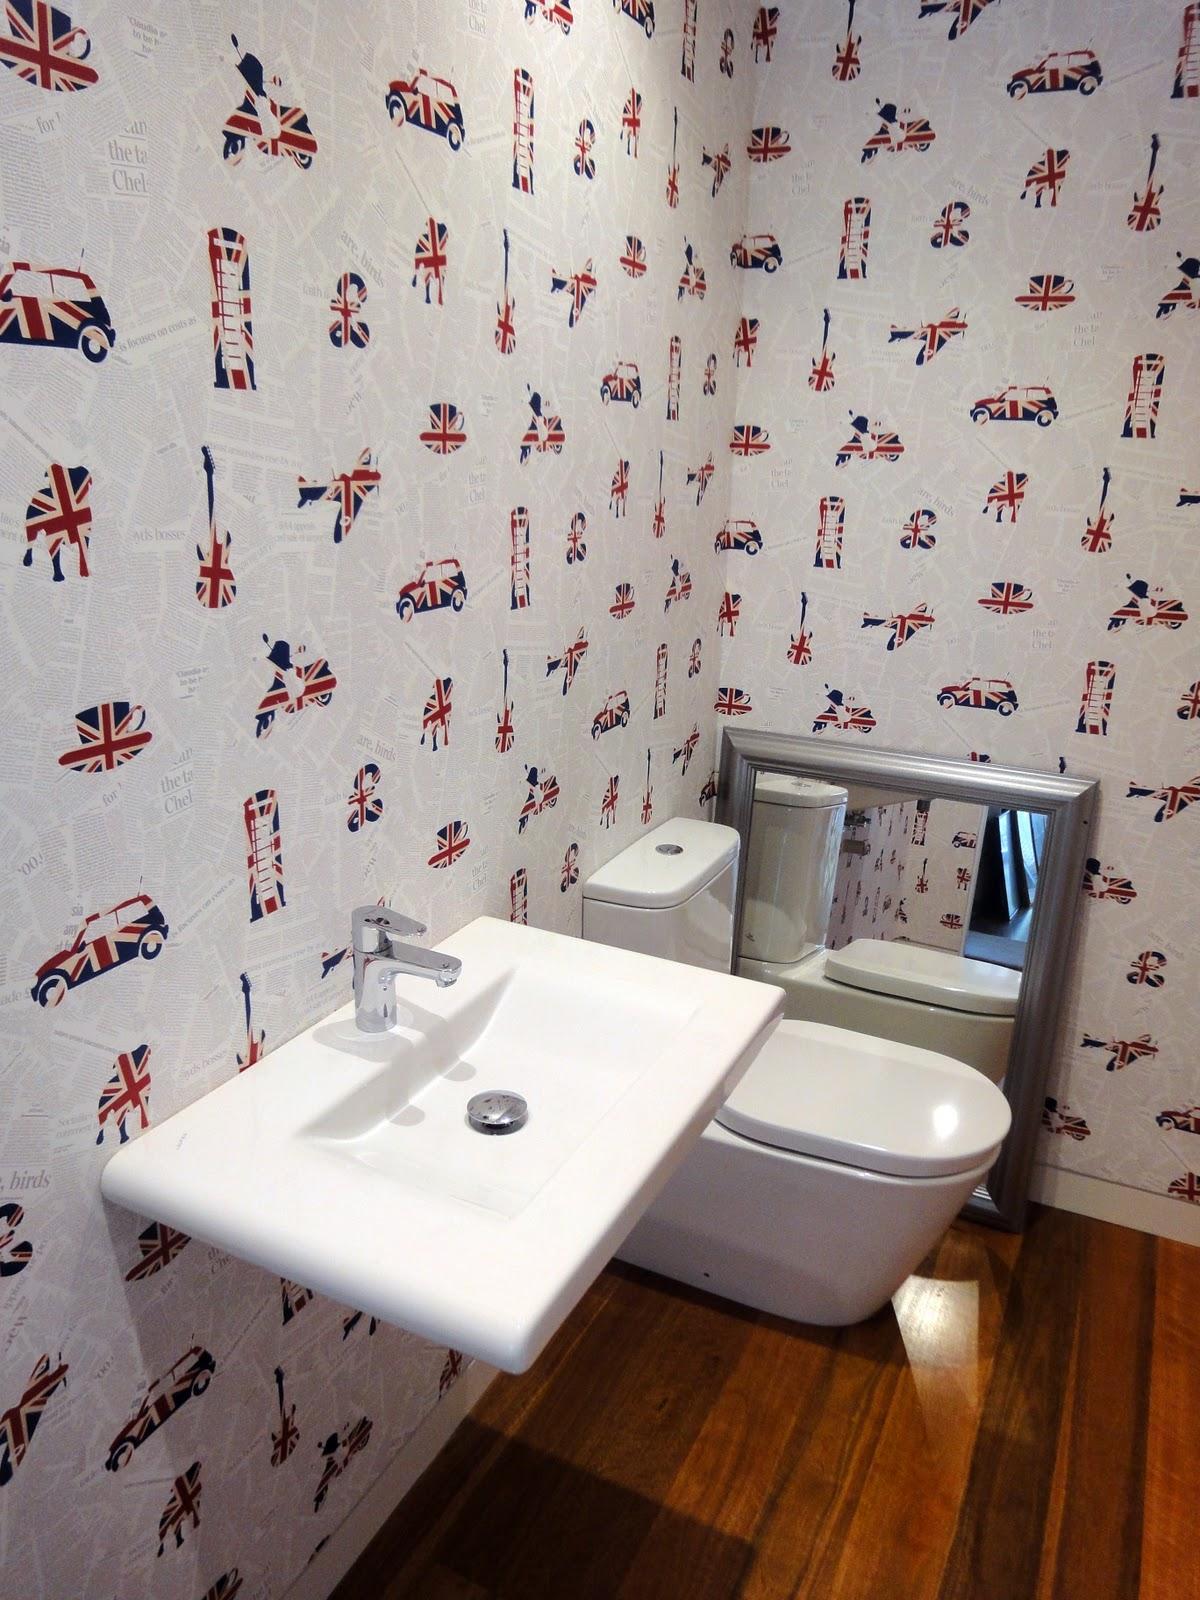 http://4.bp.blogspot.com/-4LibrI2T-pk/TnwczgYSivI/AAAAAAAABXo/CbtSXGGxox4/s1600/Rumpus+room+toilet.jpg